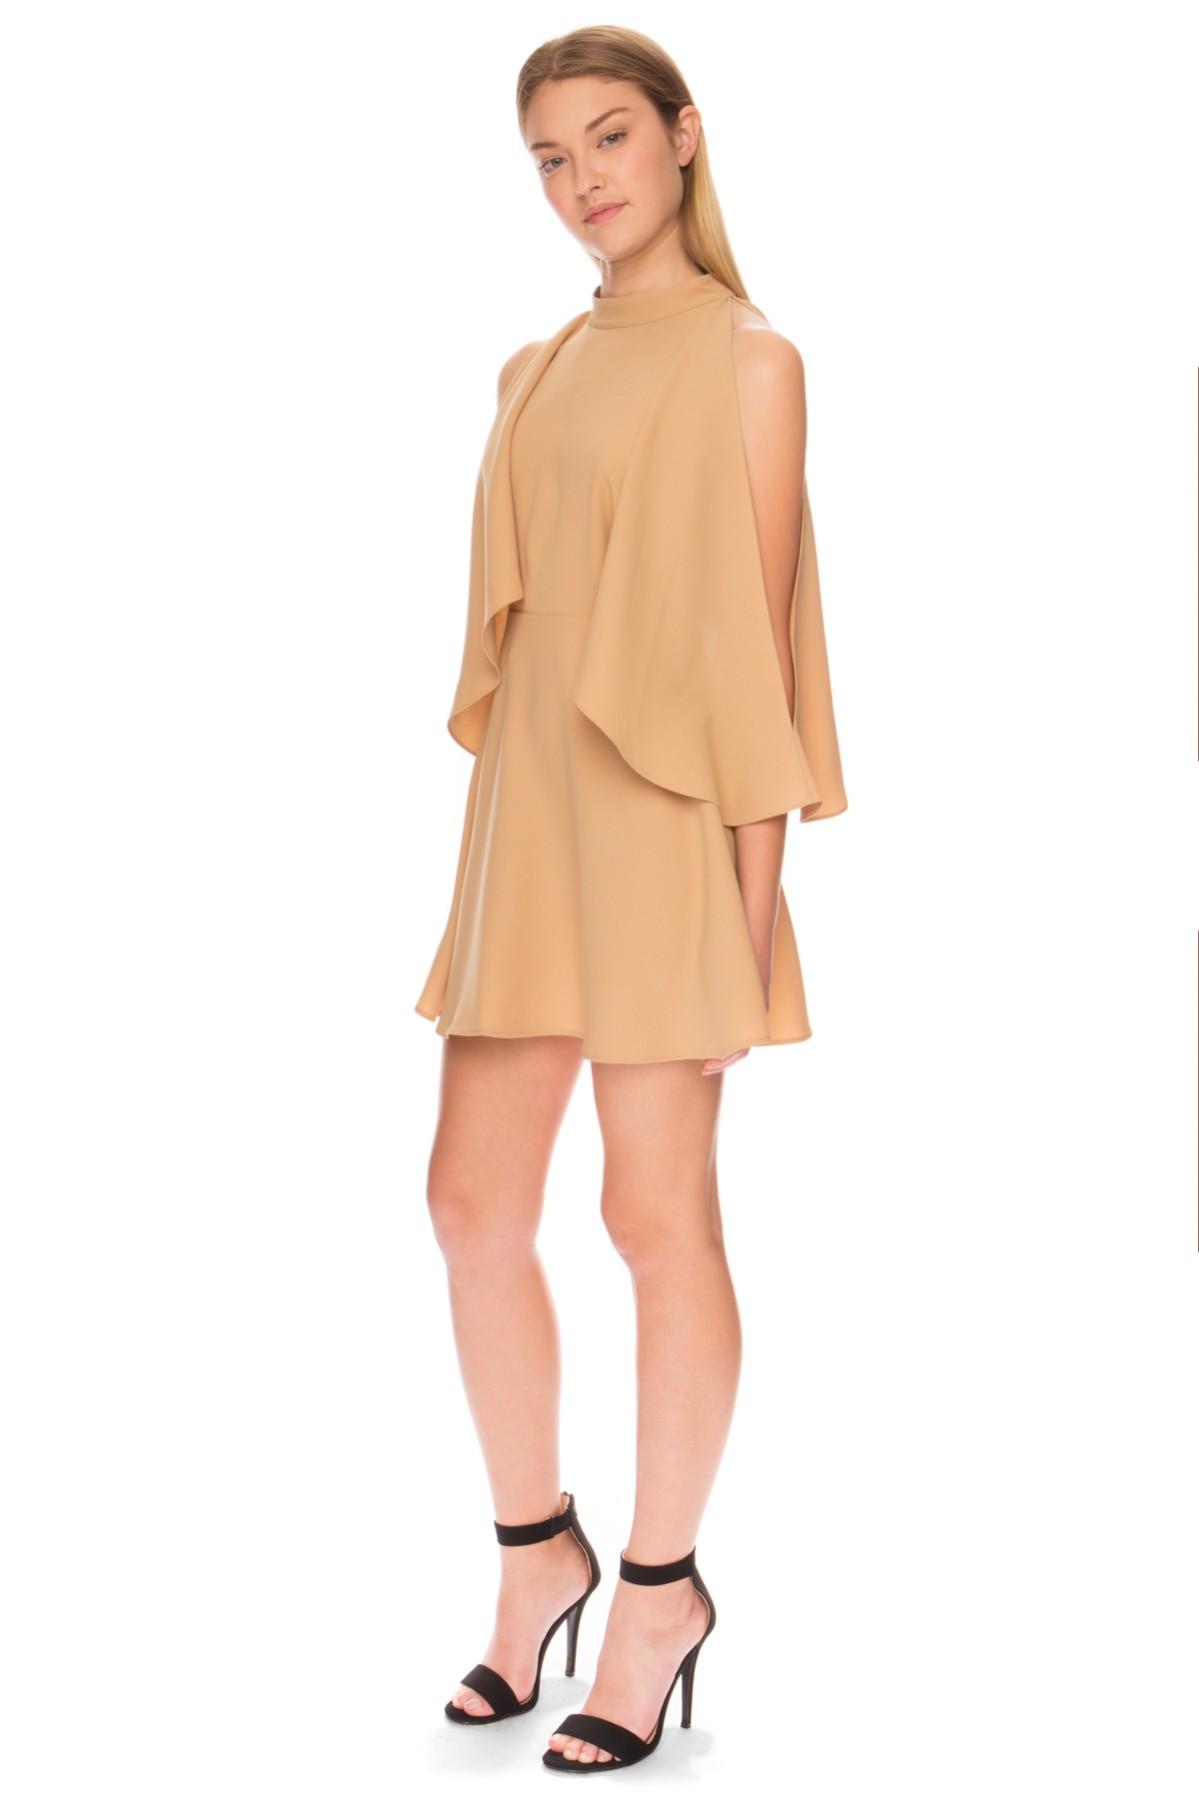 Shop Finders Real Slow Dress.